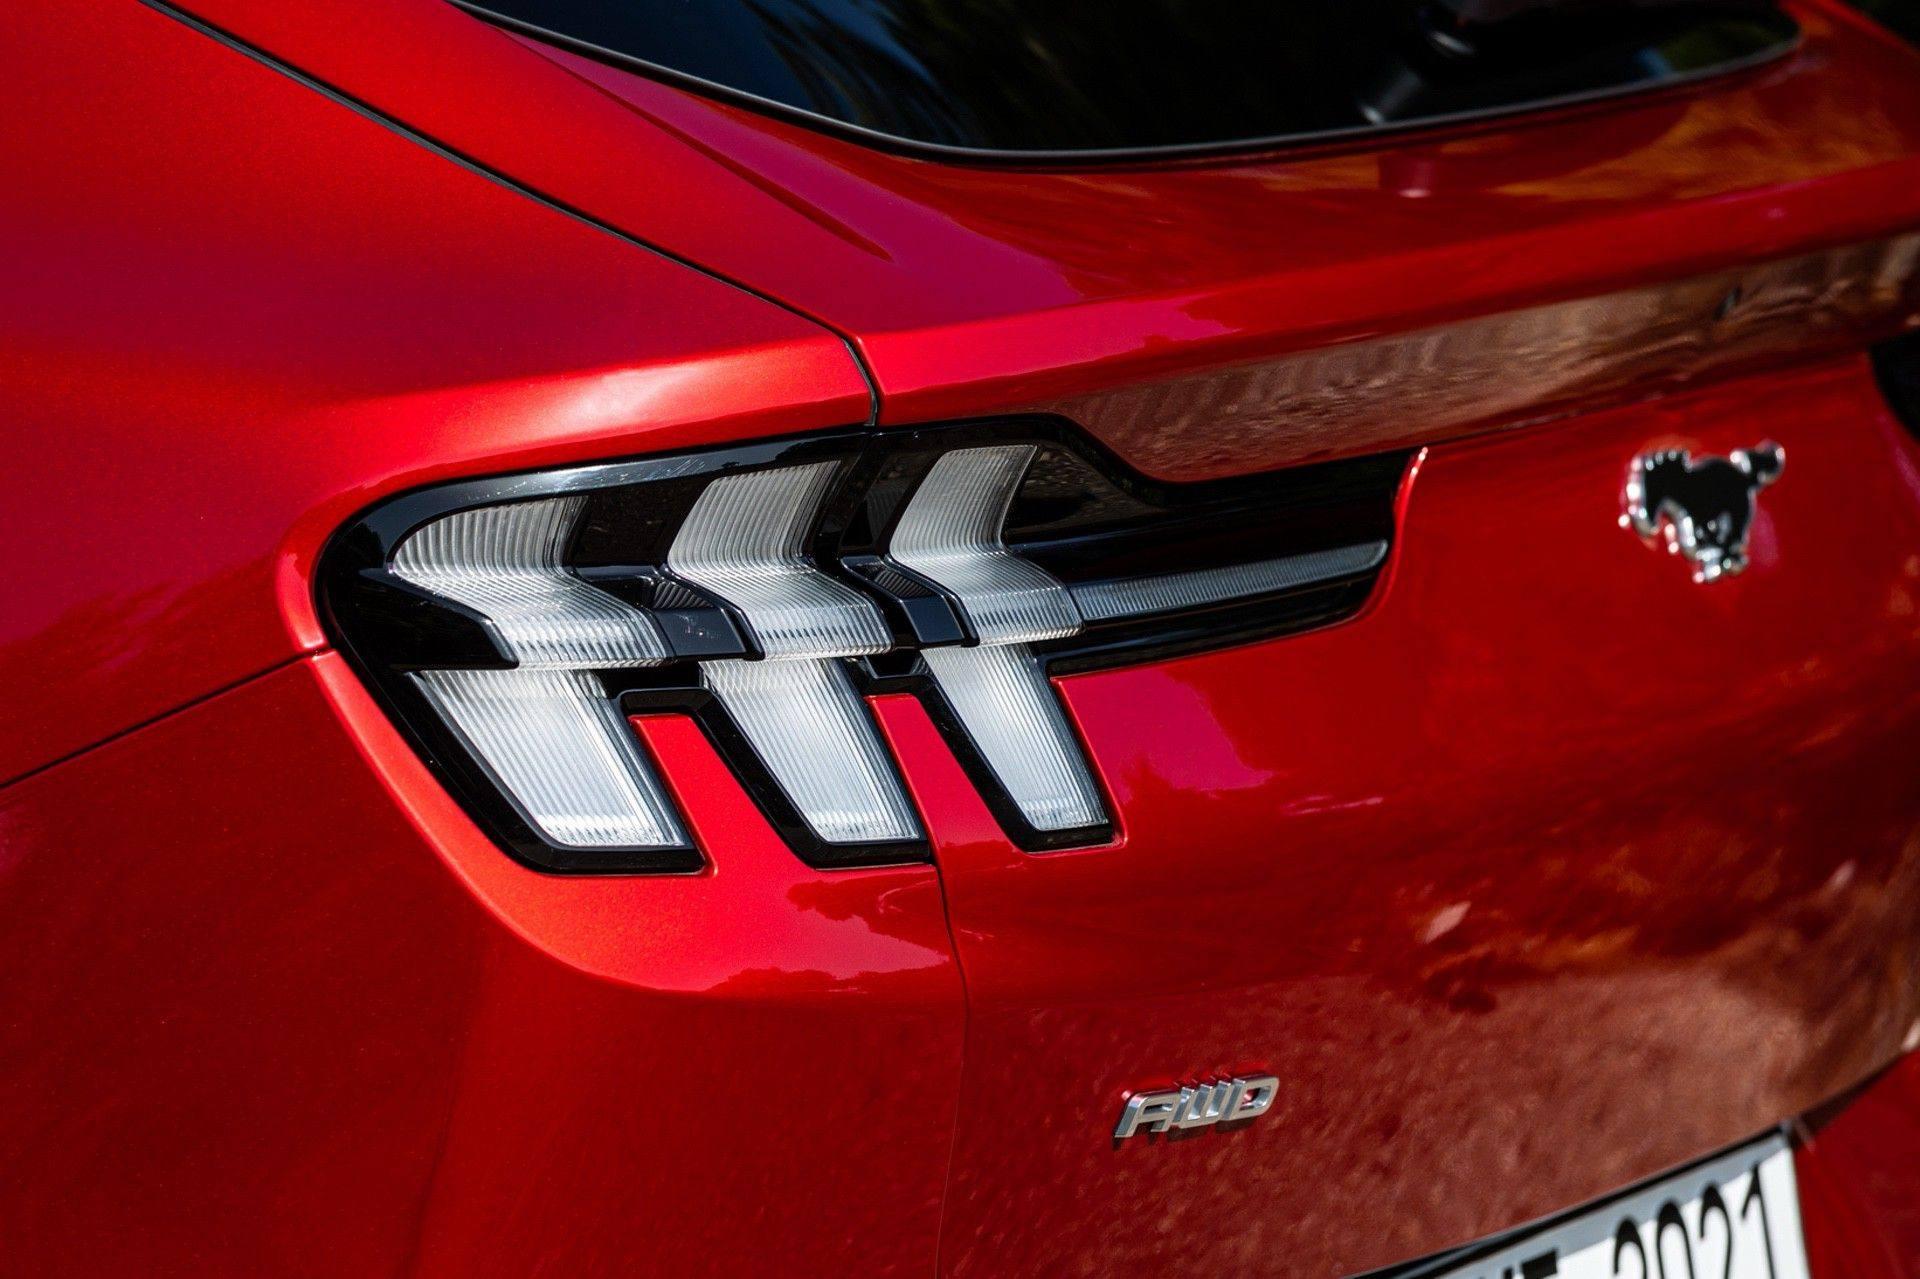 Ford_Mustang_Mach-E_greek_presskit-0173